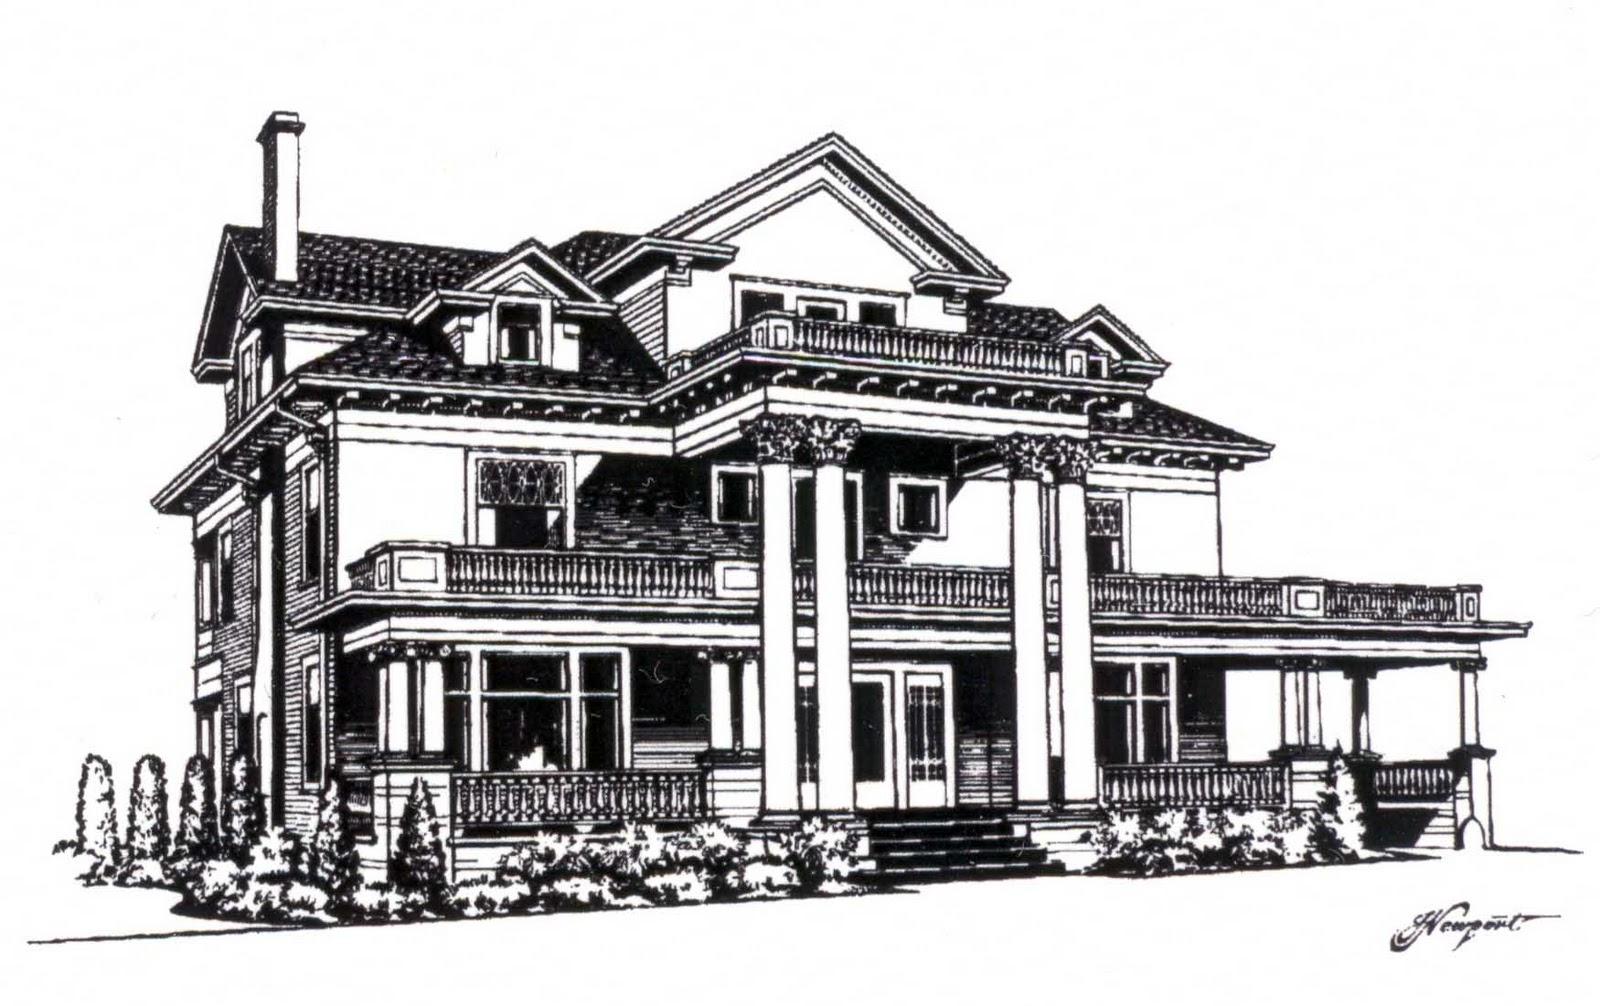 Spanish Villa House Plans Via Margutta 51 When I Say You Say 8 Mansion